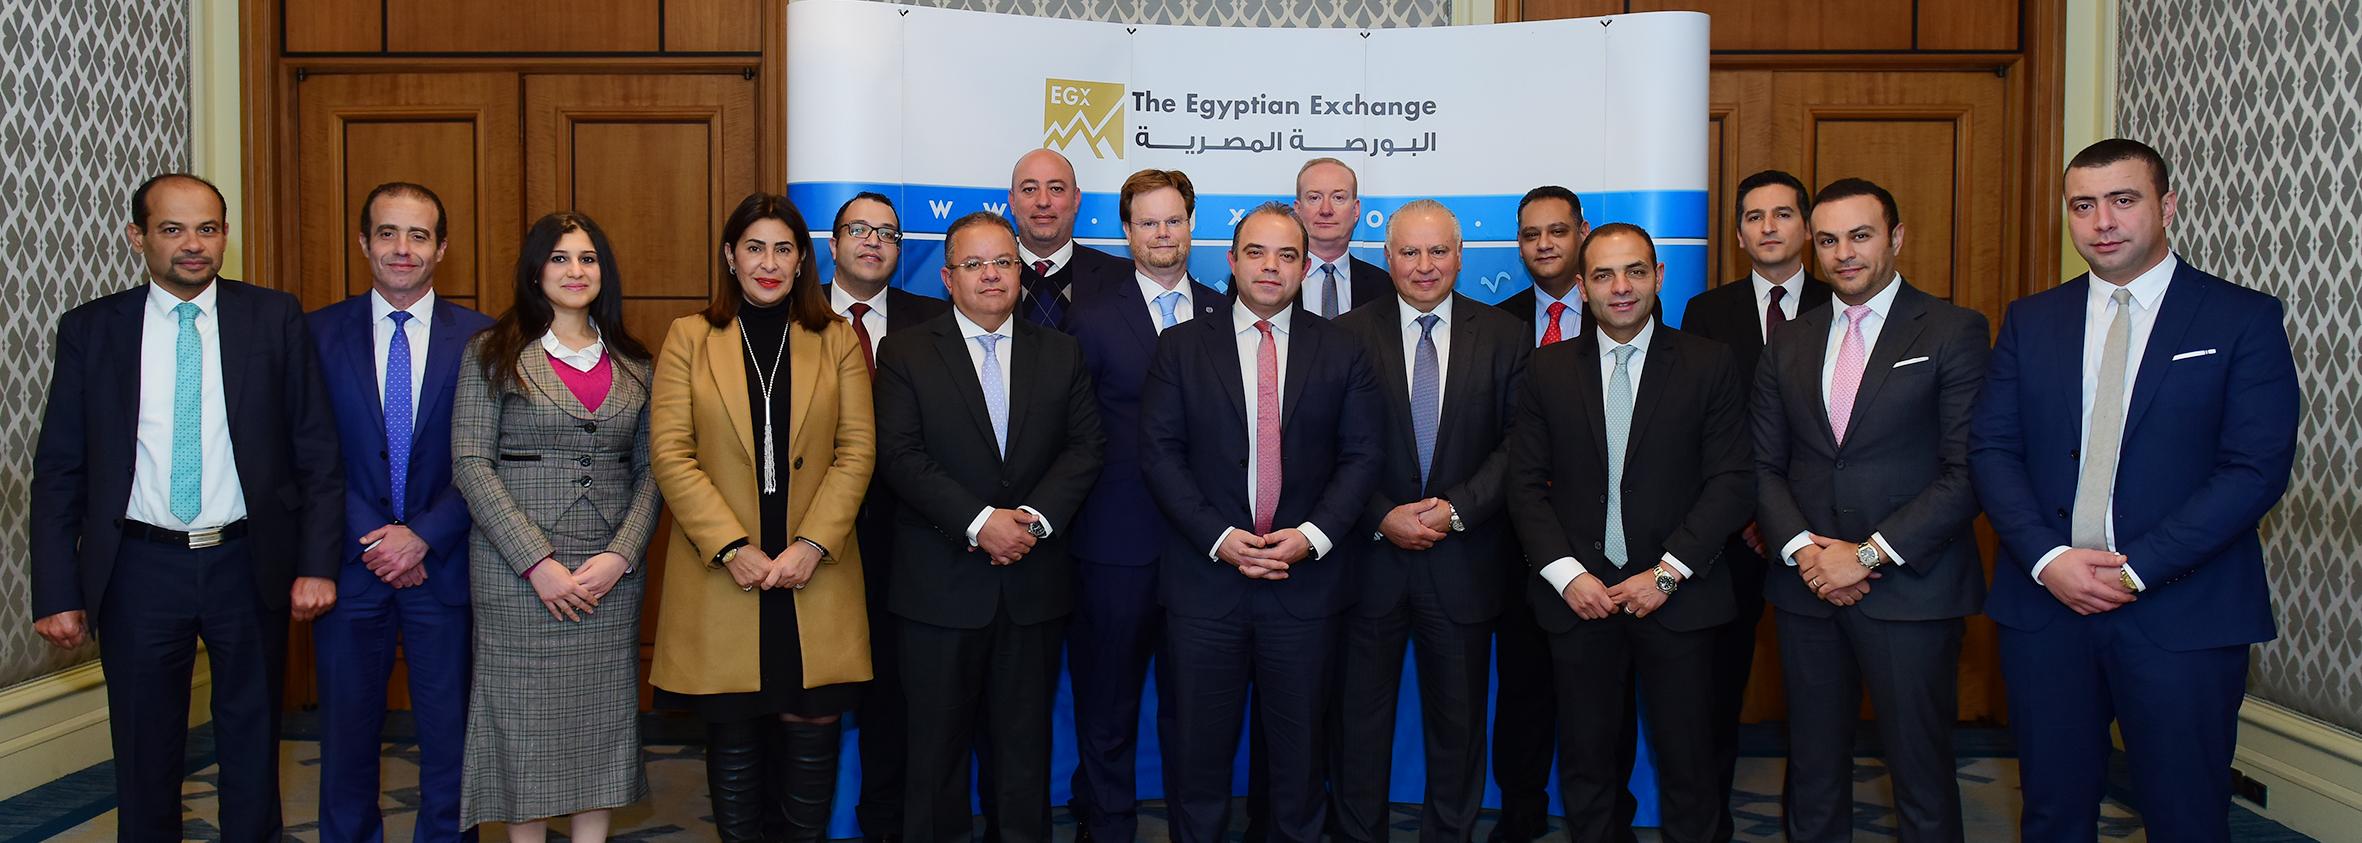 SSE serves on The Egyptian Exchange's International Advisory Committee